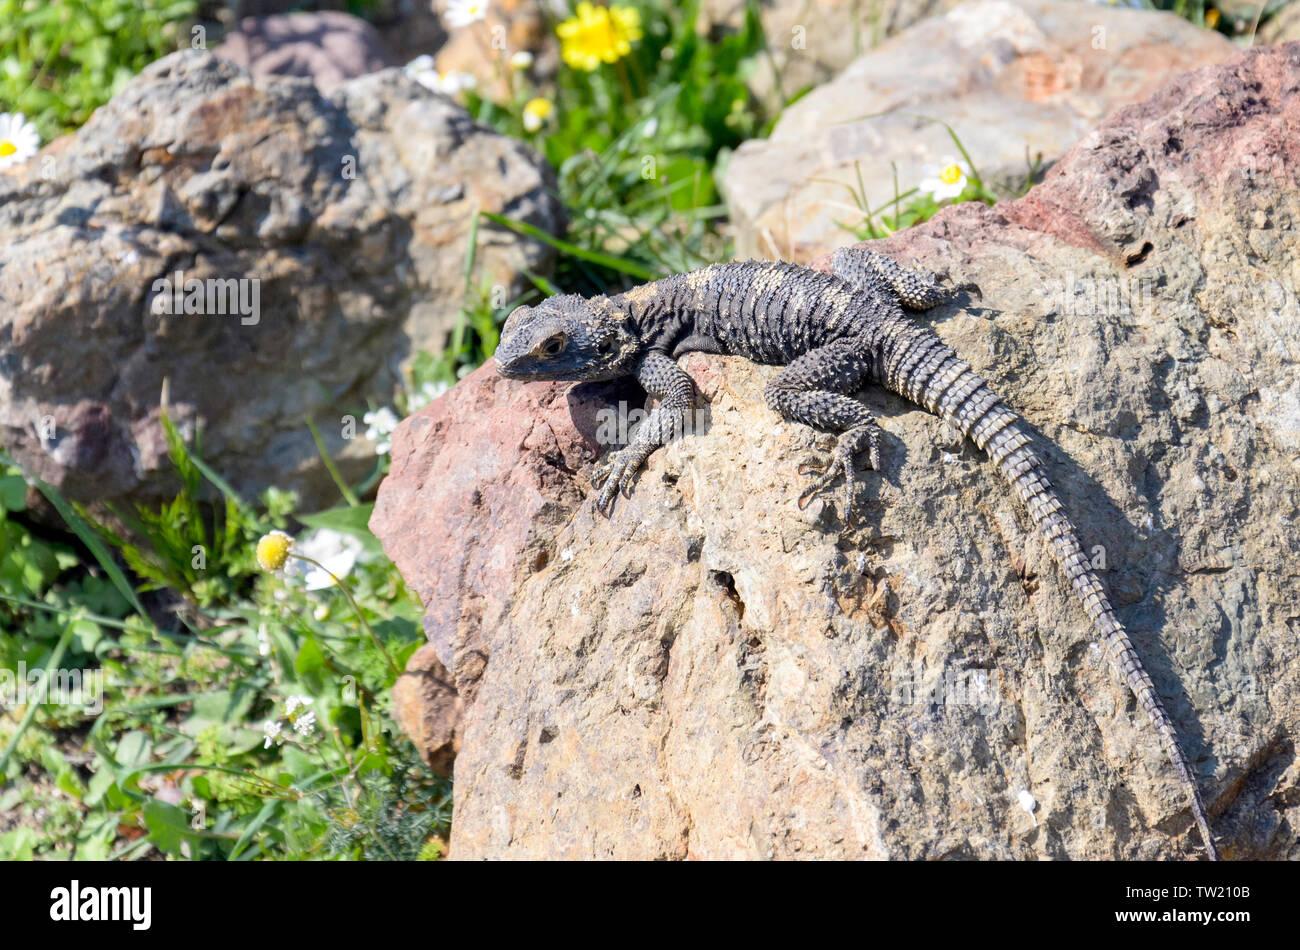 Lizard on rock - Stock Image